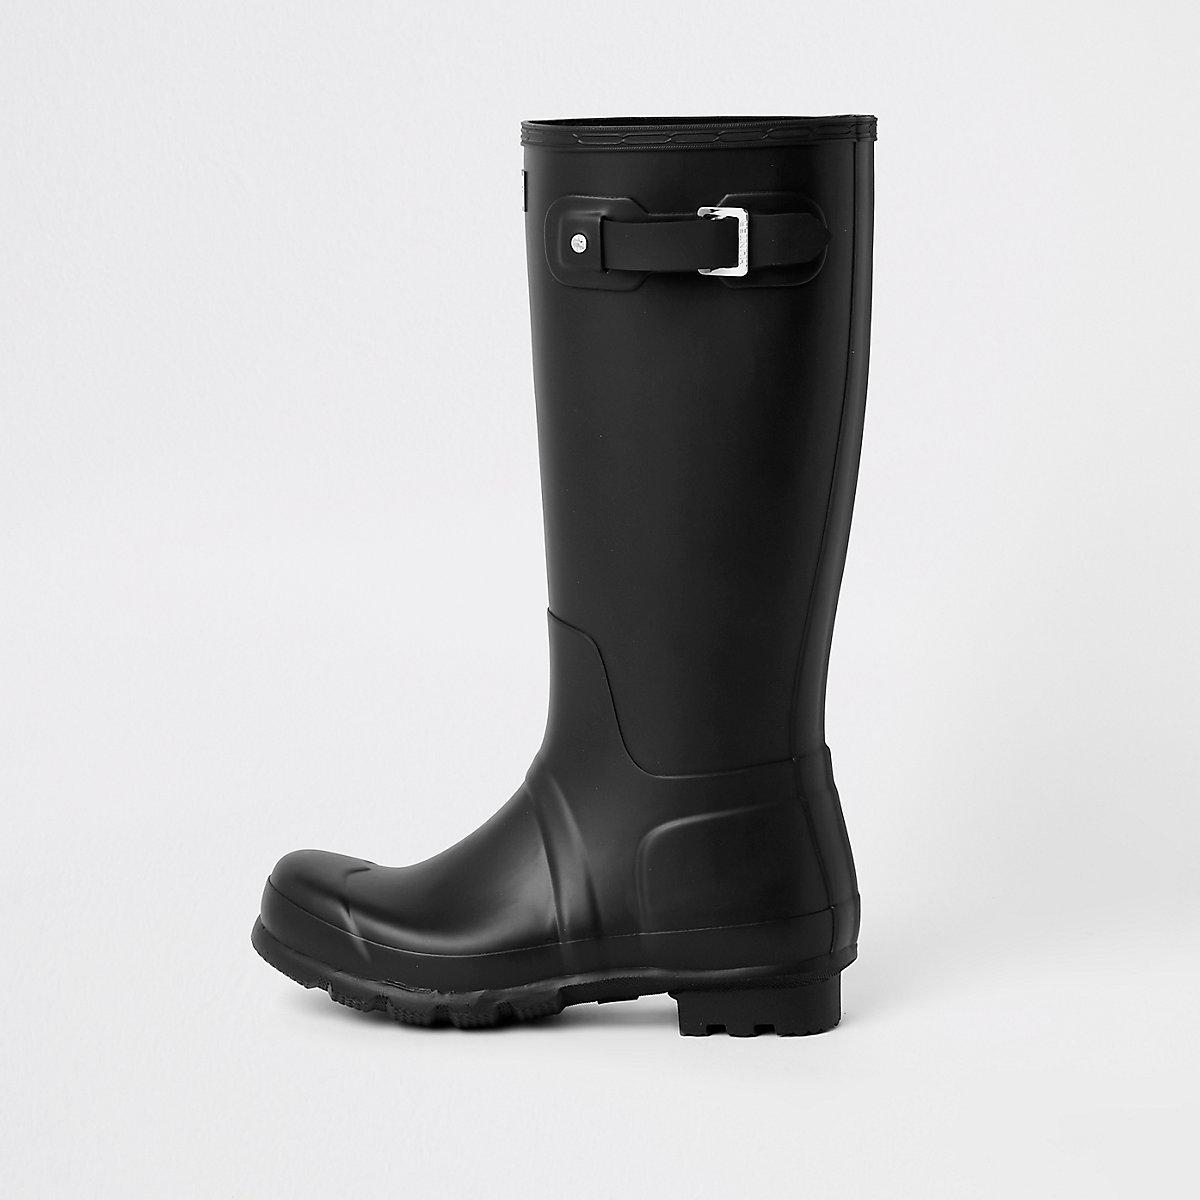 Hunter Original black tall rubber boots